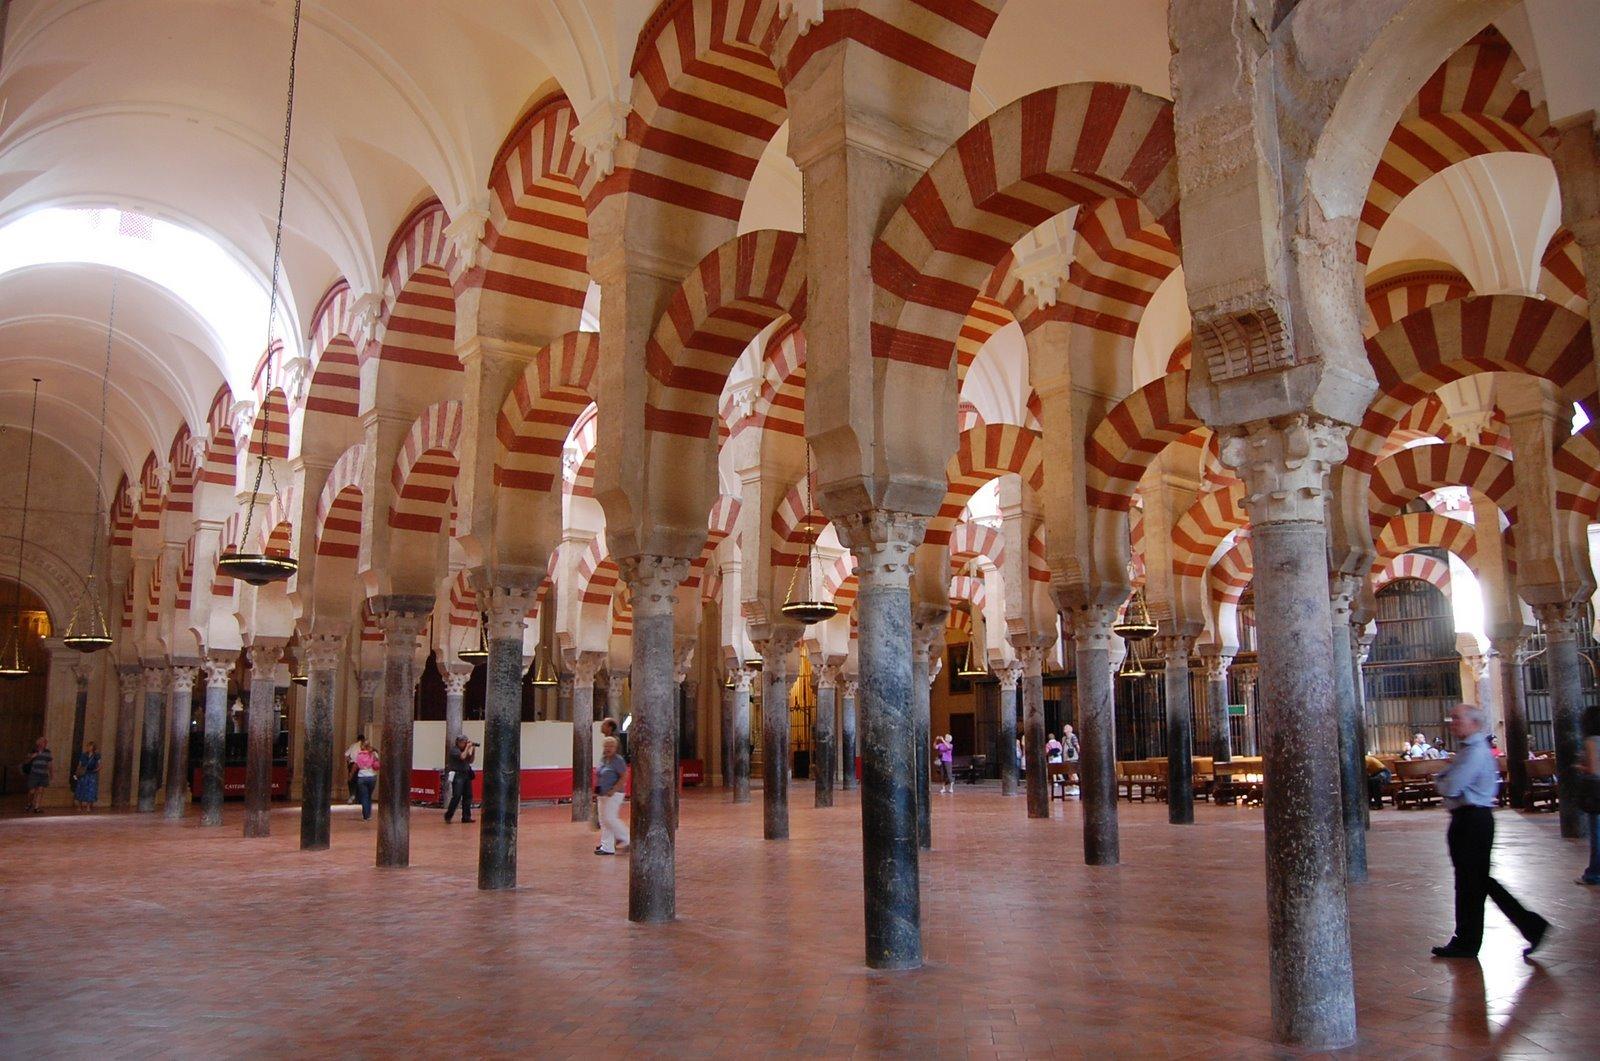 Mezquita Picture: Córdoba, Spain -- Final Expansion Of The Mosque